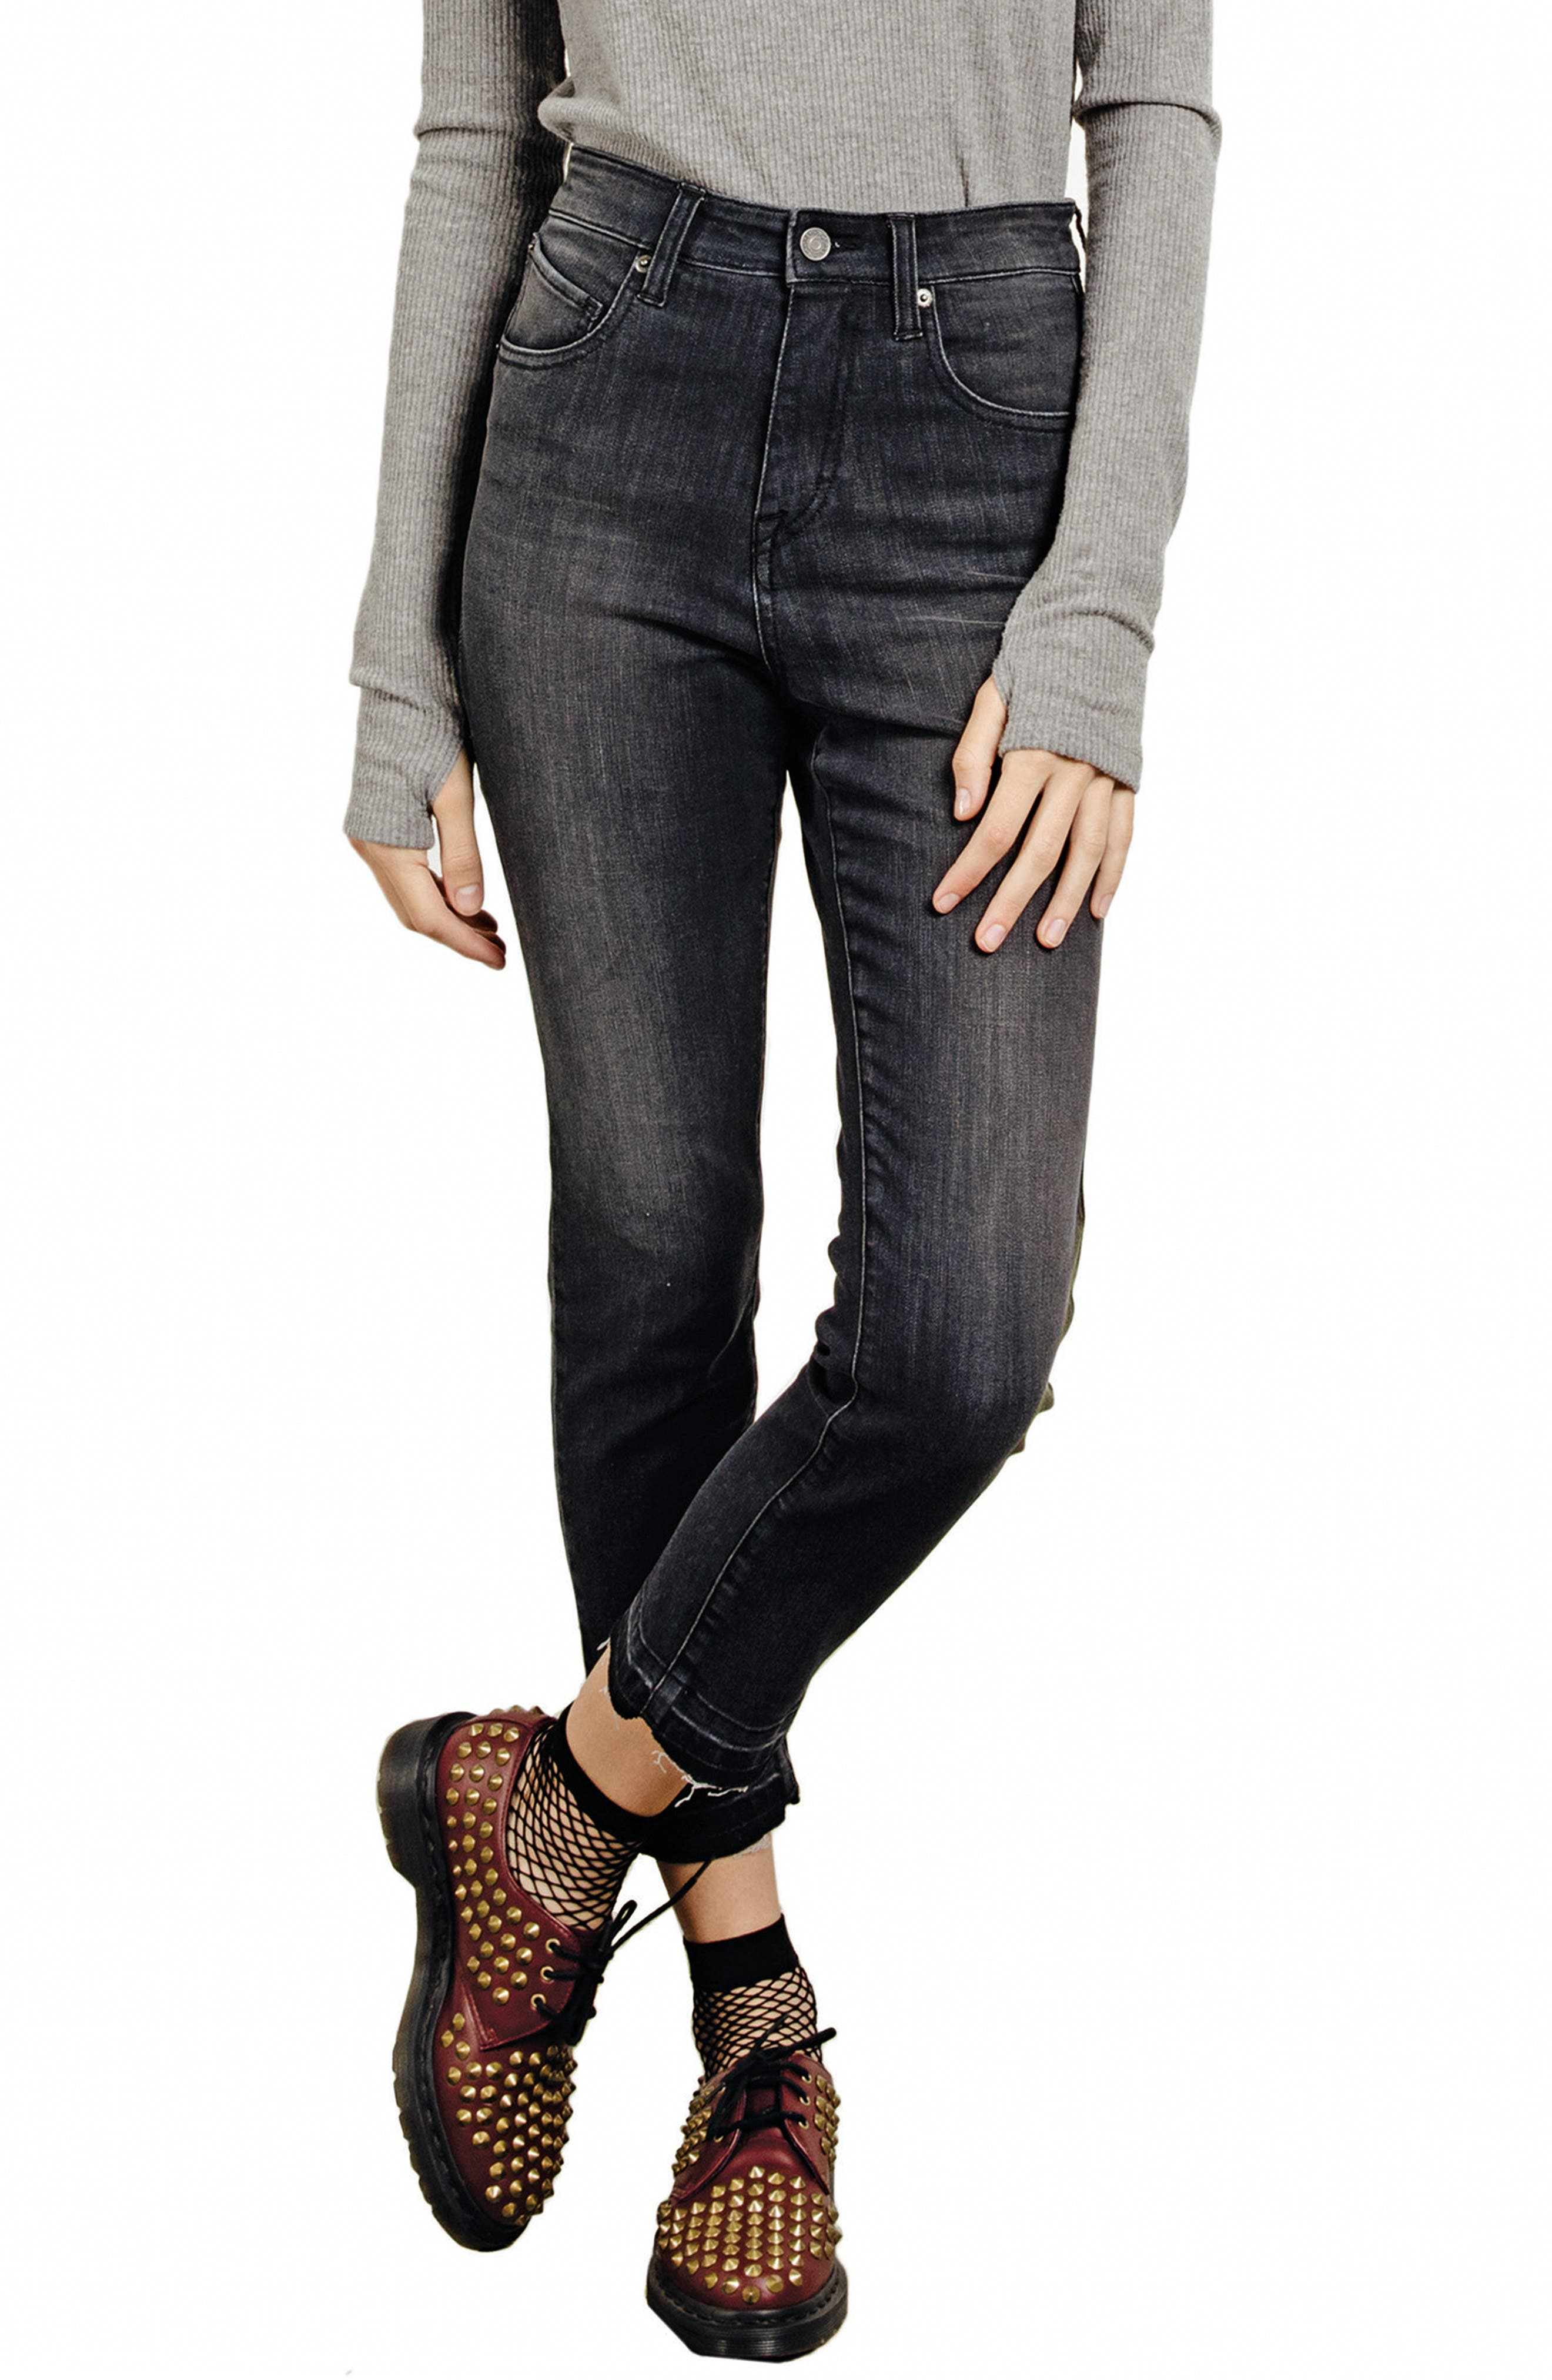 Volcom Lady High Waist Jeans